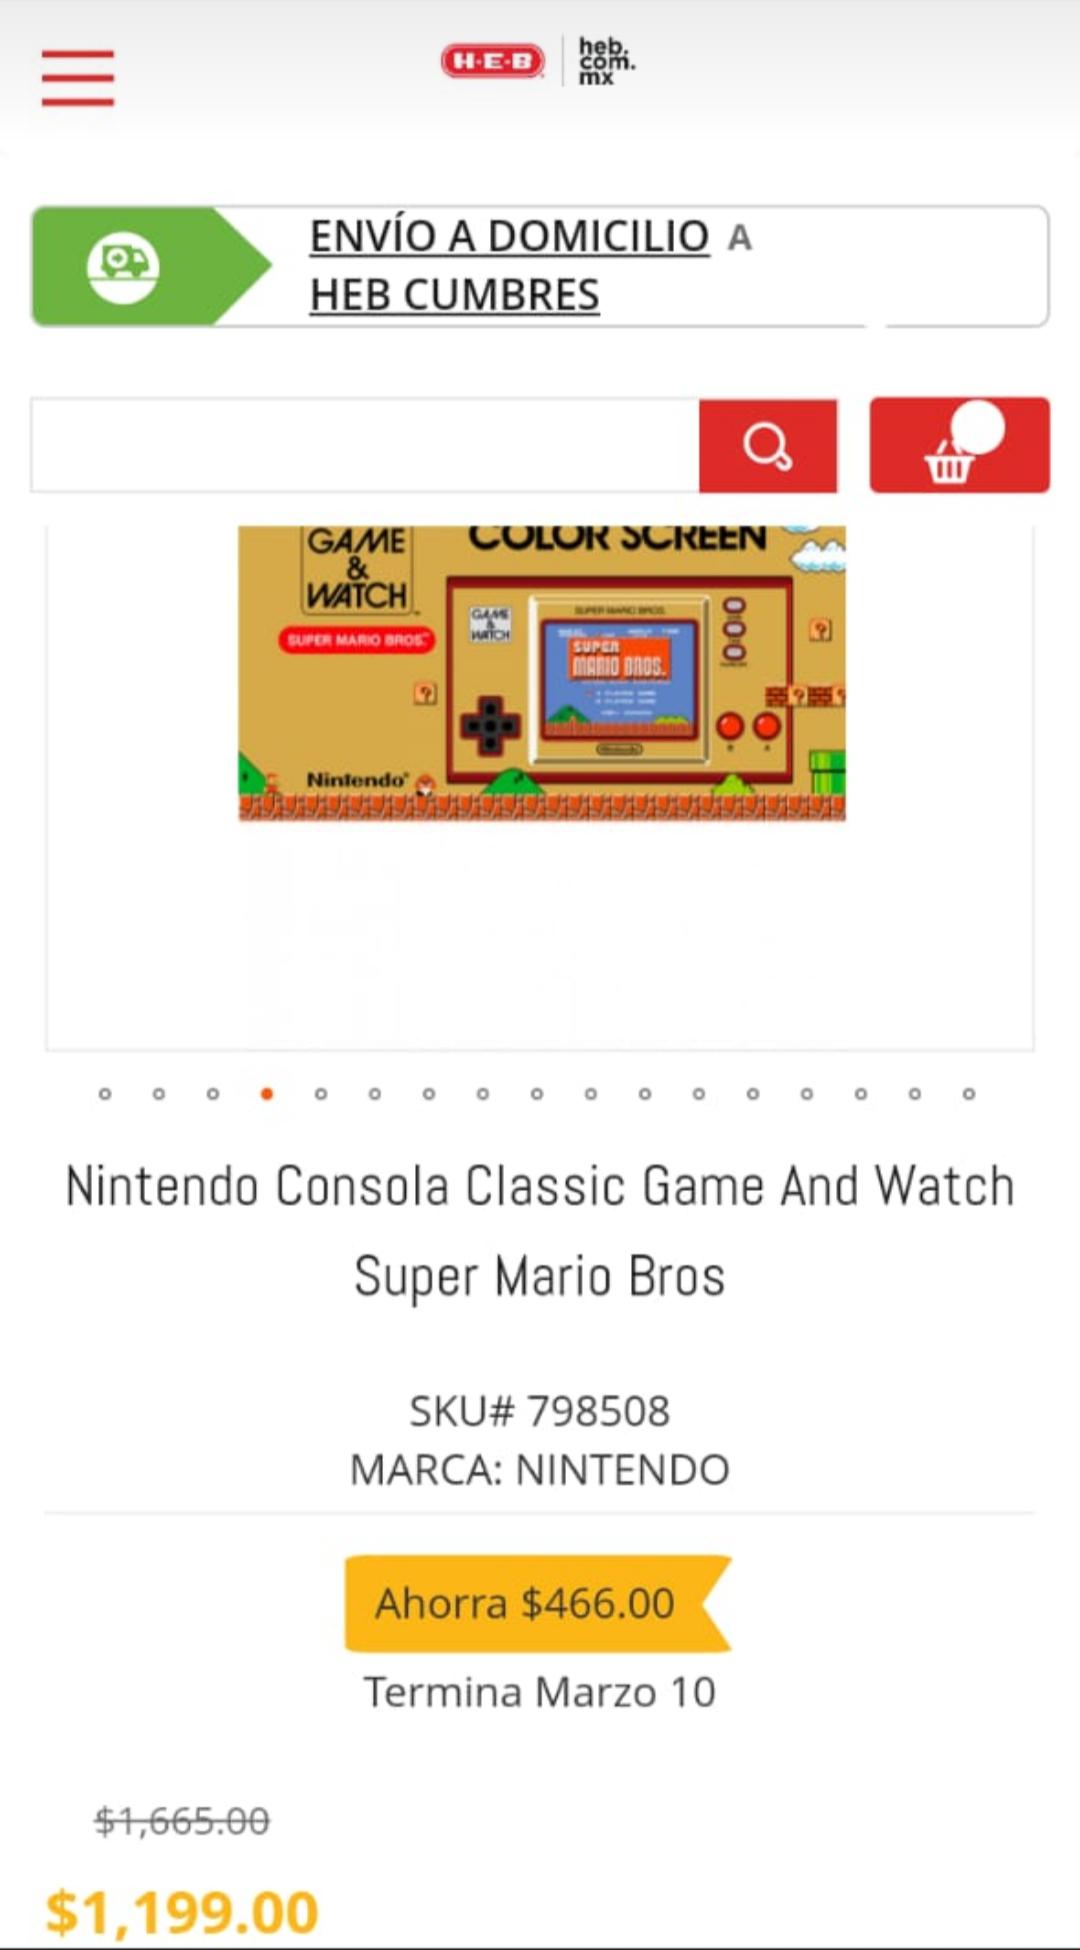 Heb Nintendo Consola Classic Game And Watch Super Mario Bros